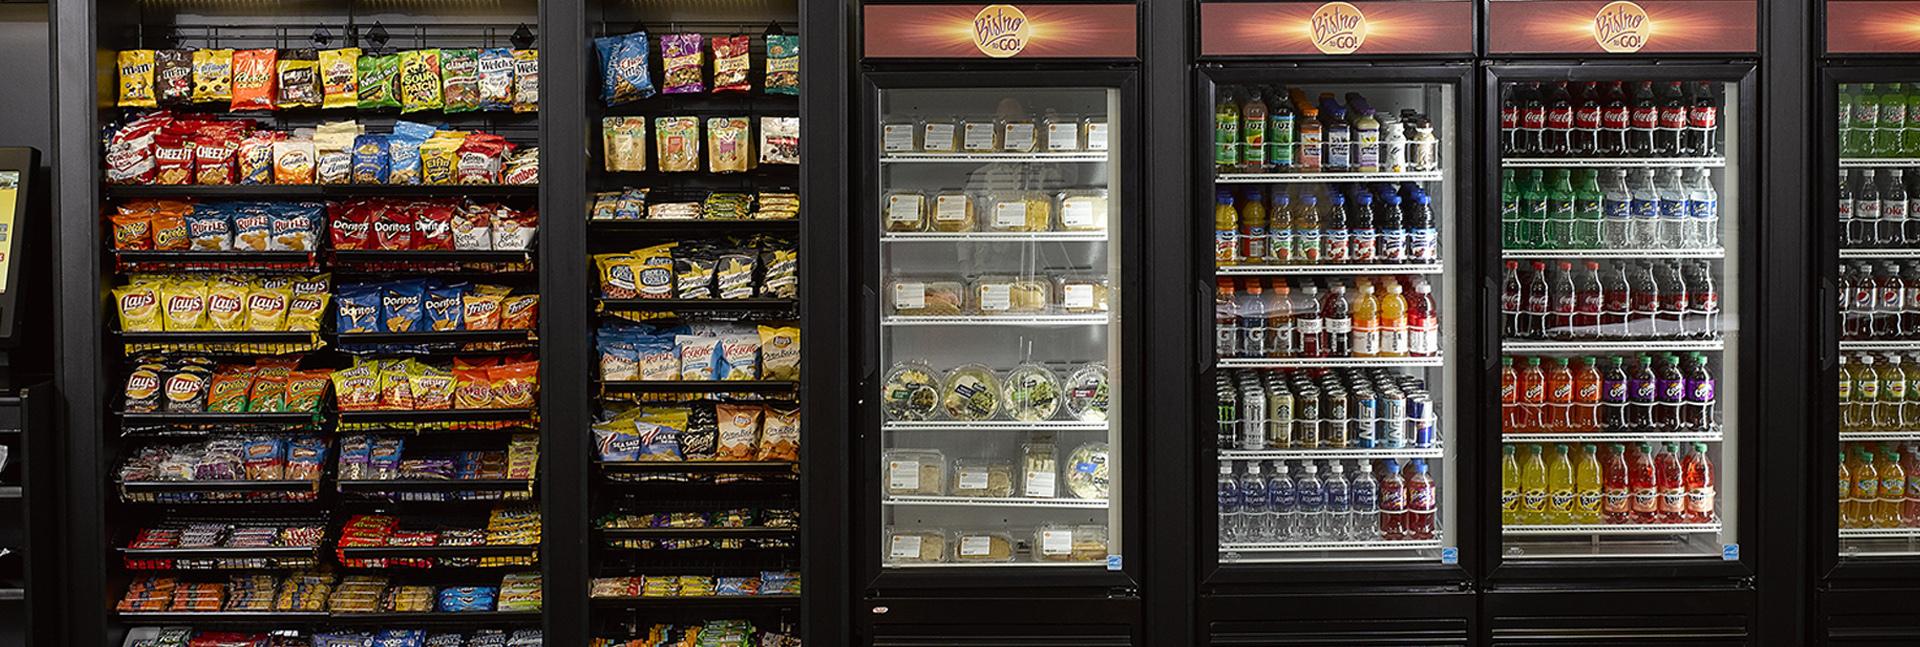 Micro Market Vending Machines